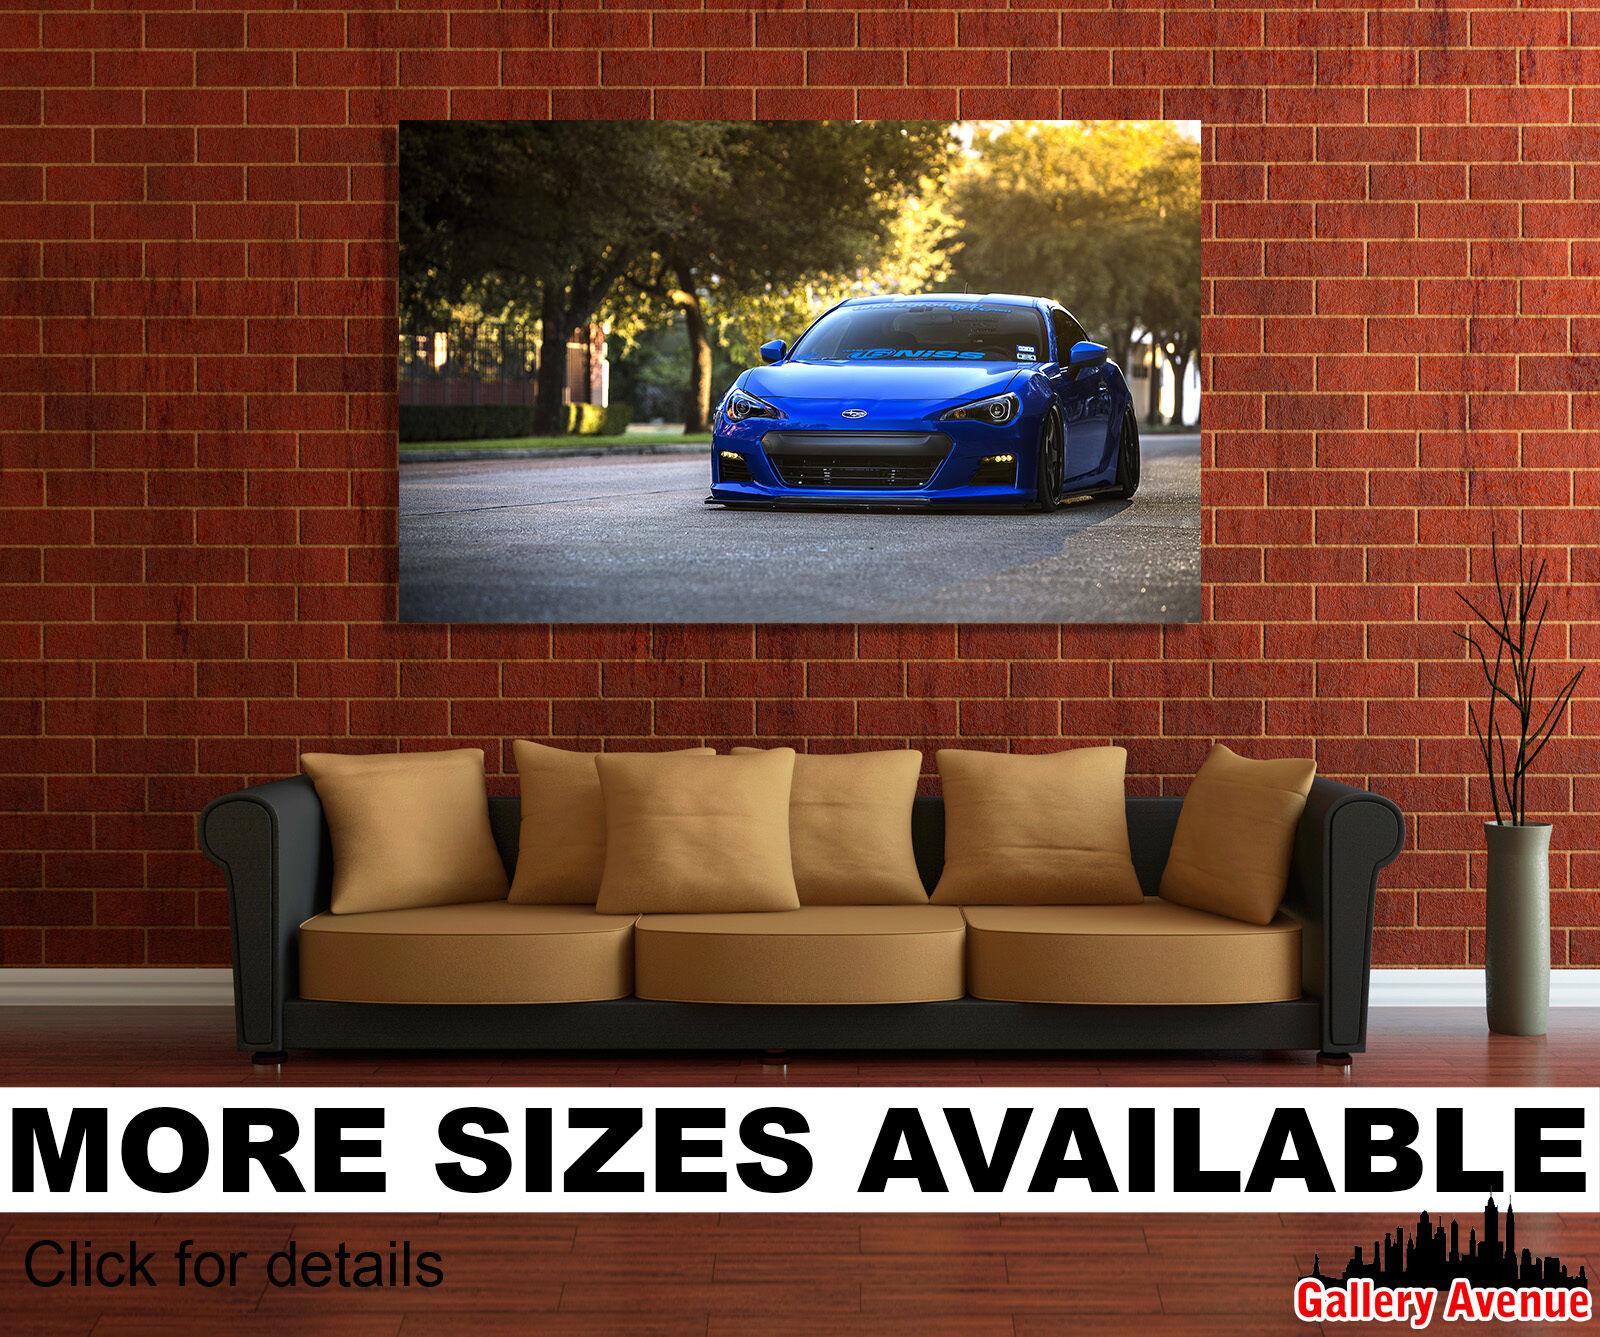 Wall Art Canvas Picture Print - Subaru BRZ Sports Car 3.2